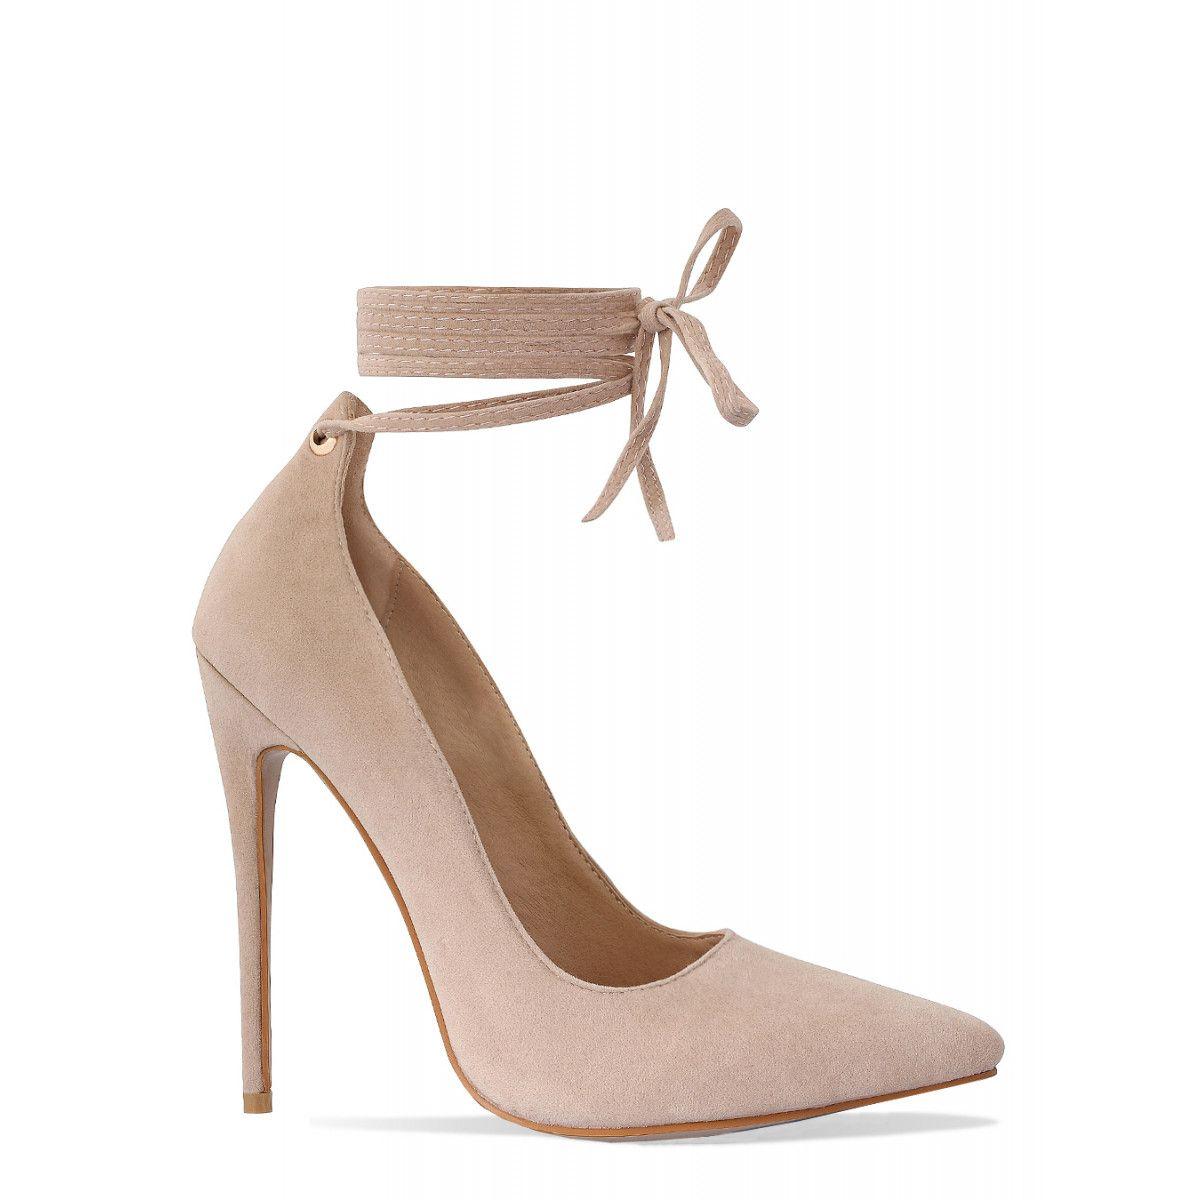 b88b306af4ec 2017 Simmi Shoe Trends Wrap around clear heel in nude